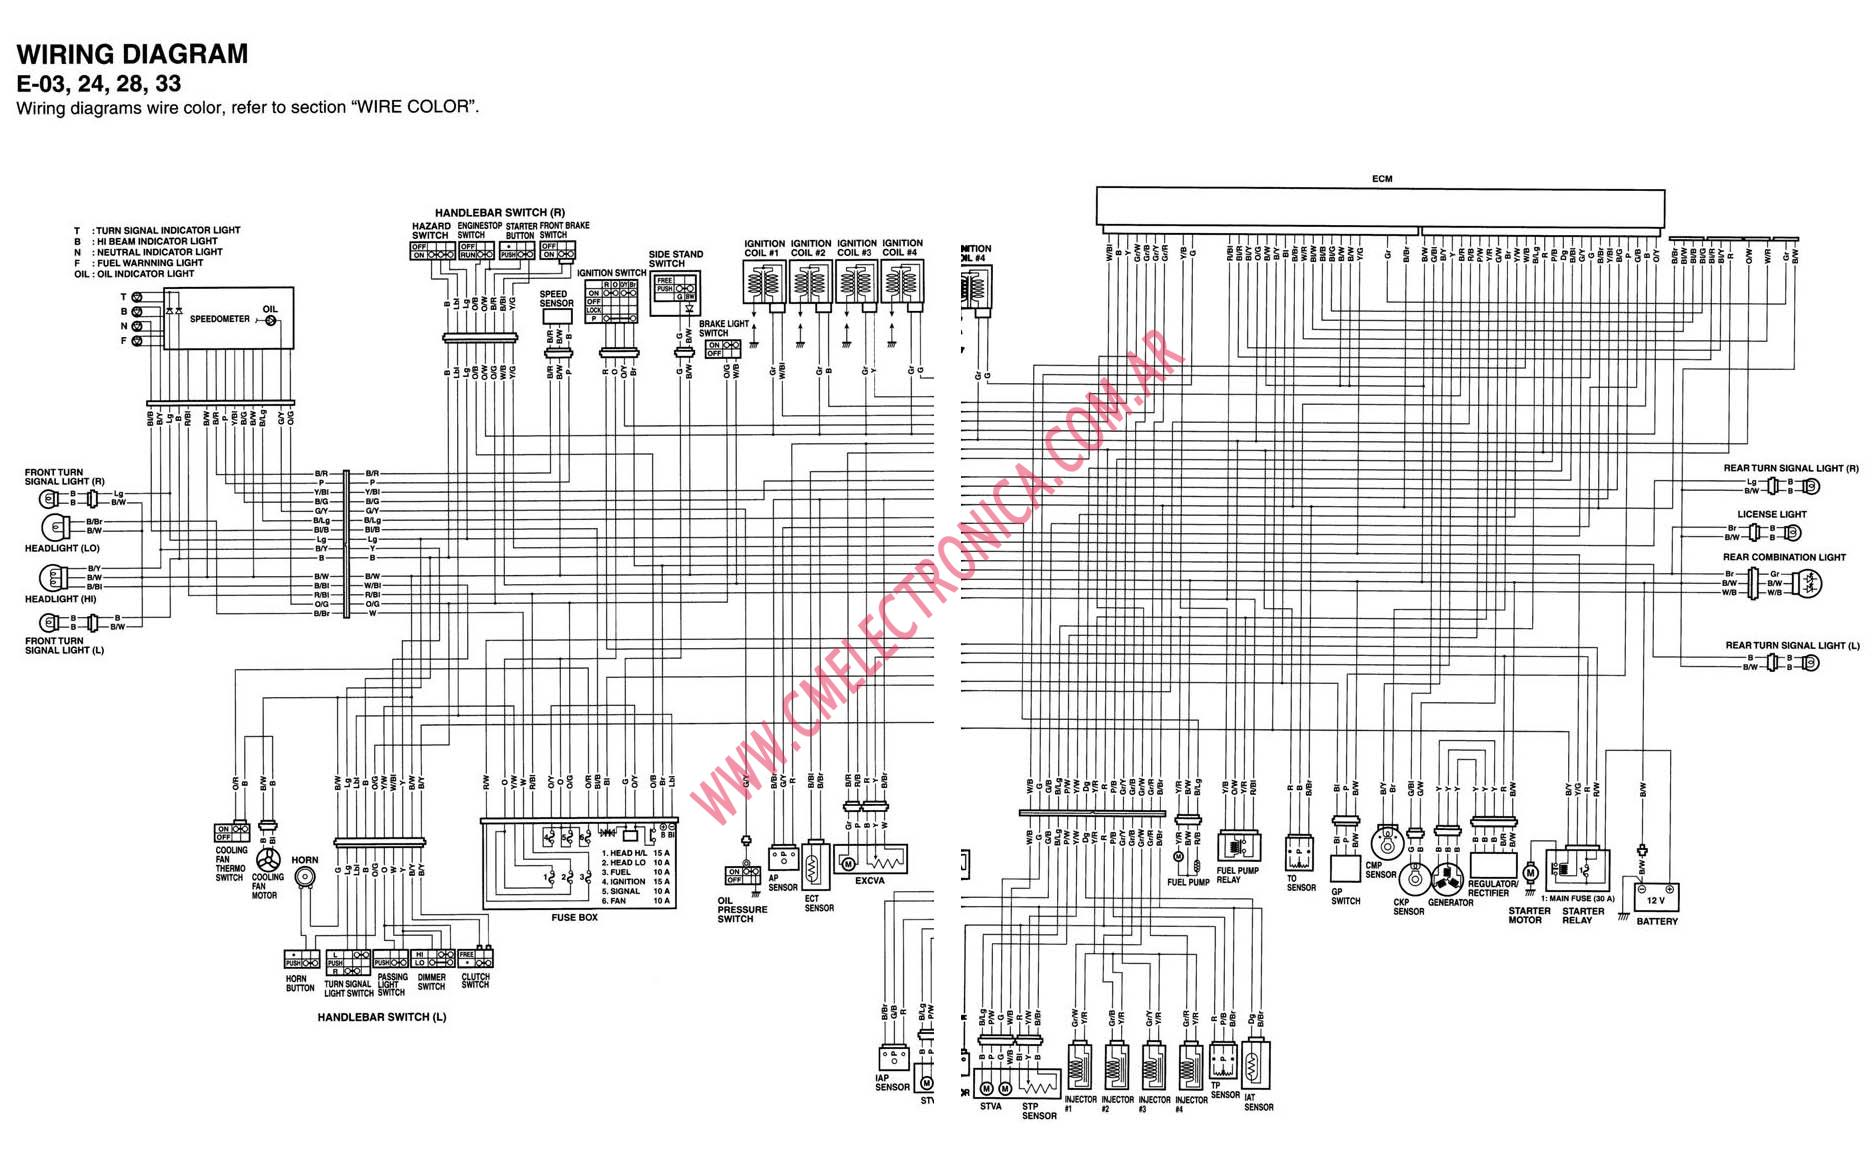 Katana 600 Ignition Switch Wiring Diagram